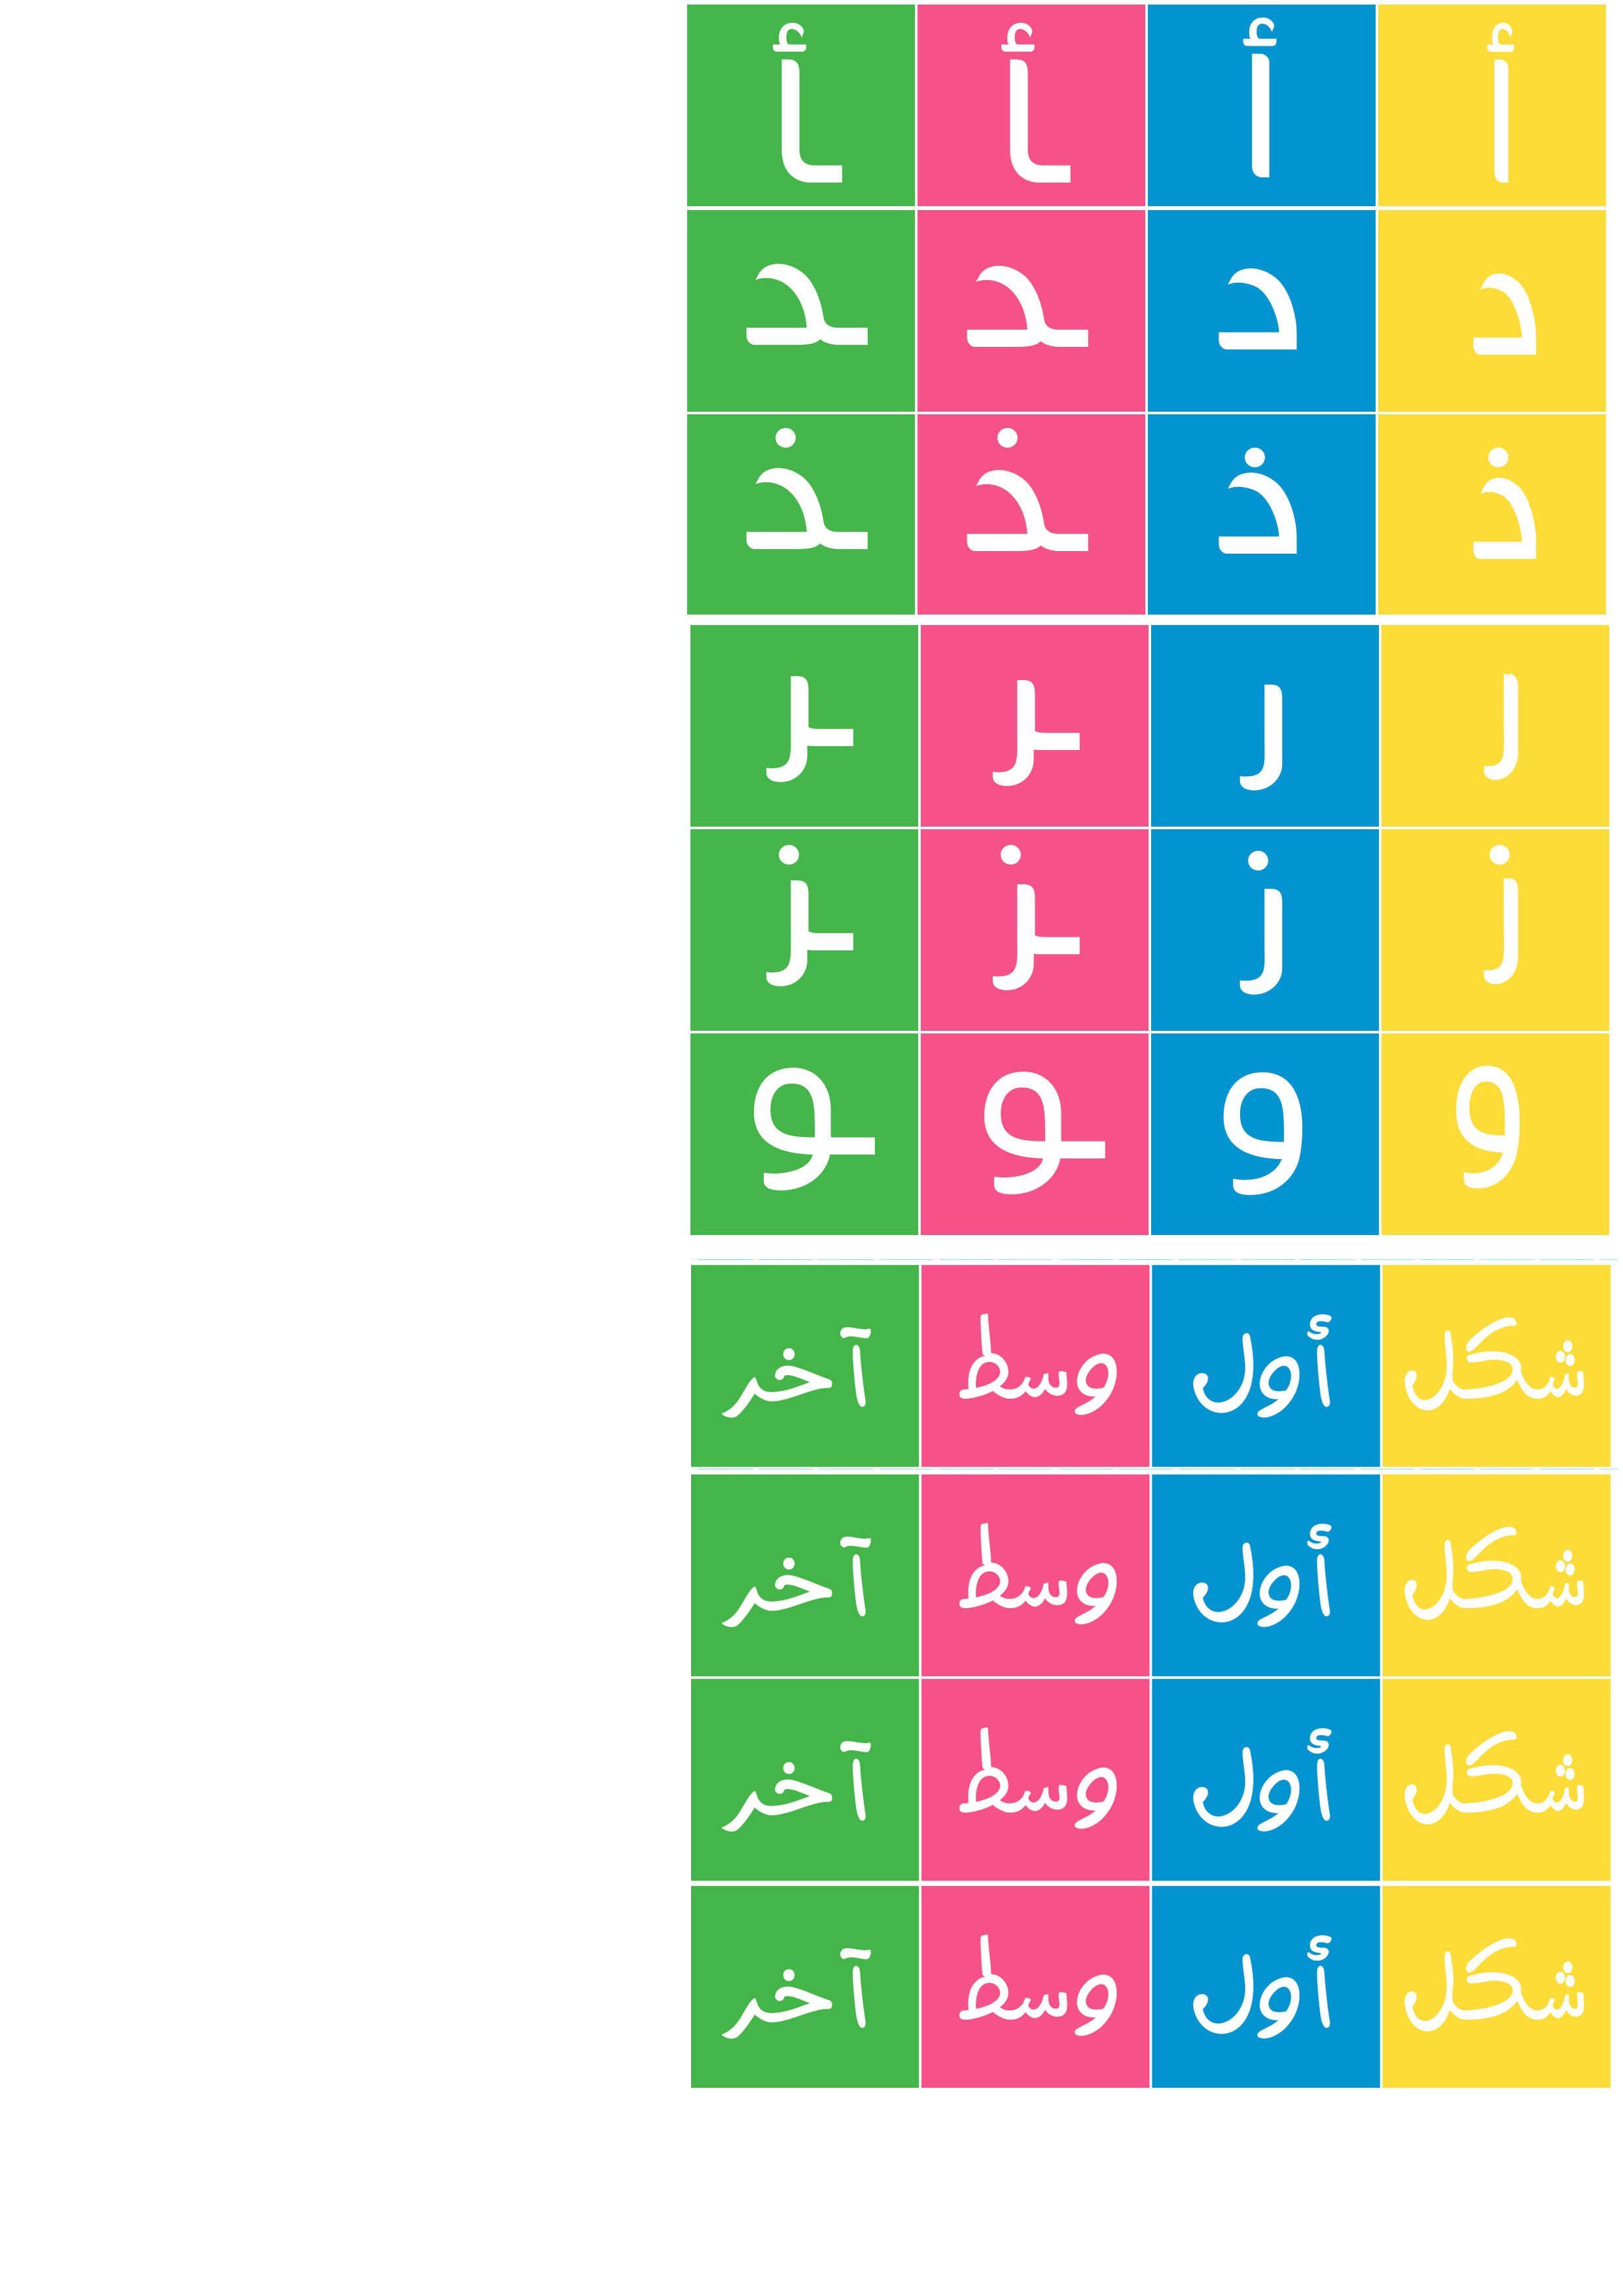 Pin By Hanaa Goriel On أوراق خاصة بفيديو اليوتيوب Arabic Alphabet For Kids Arabic Alphabet Alphabet Printables